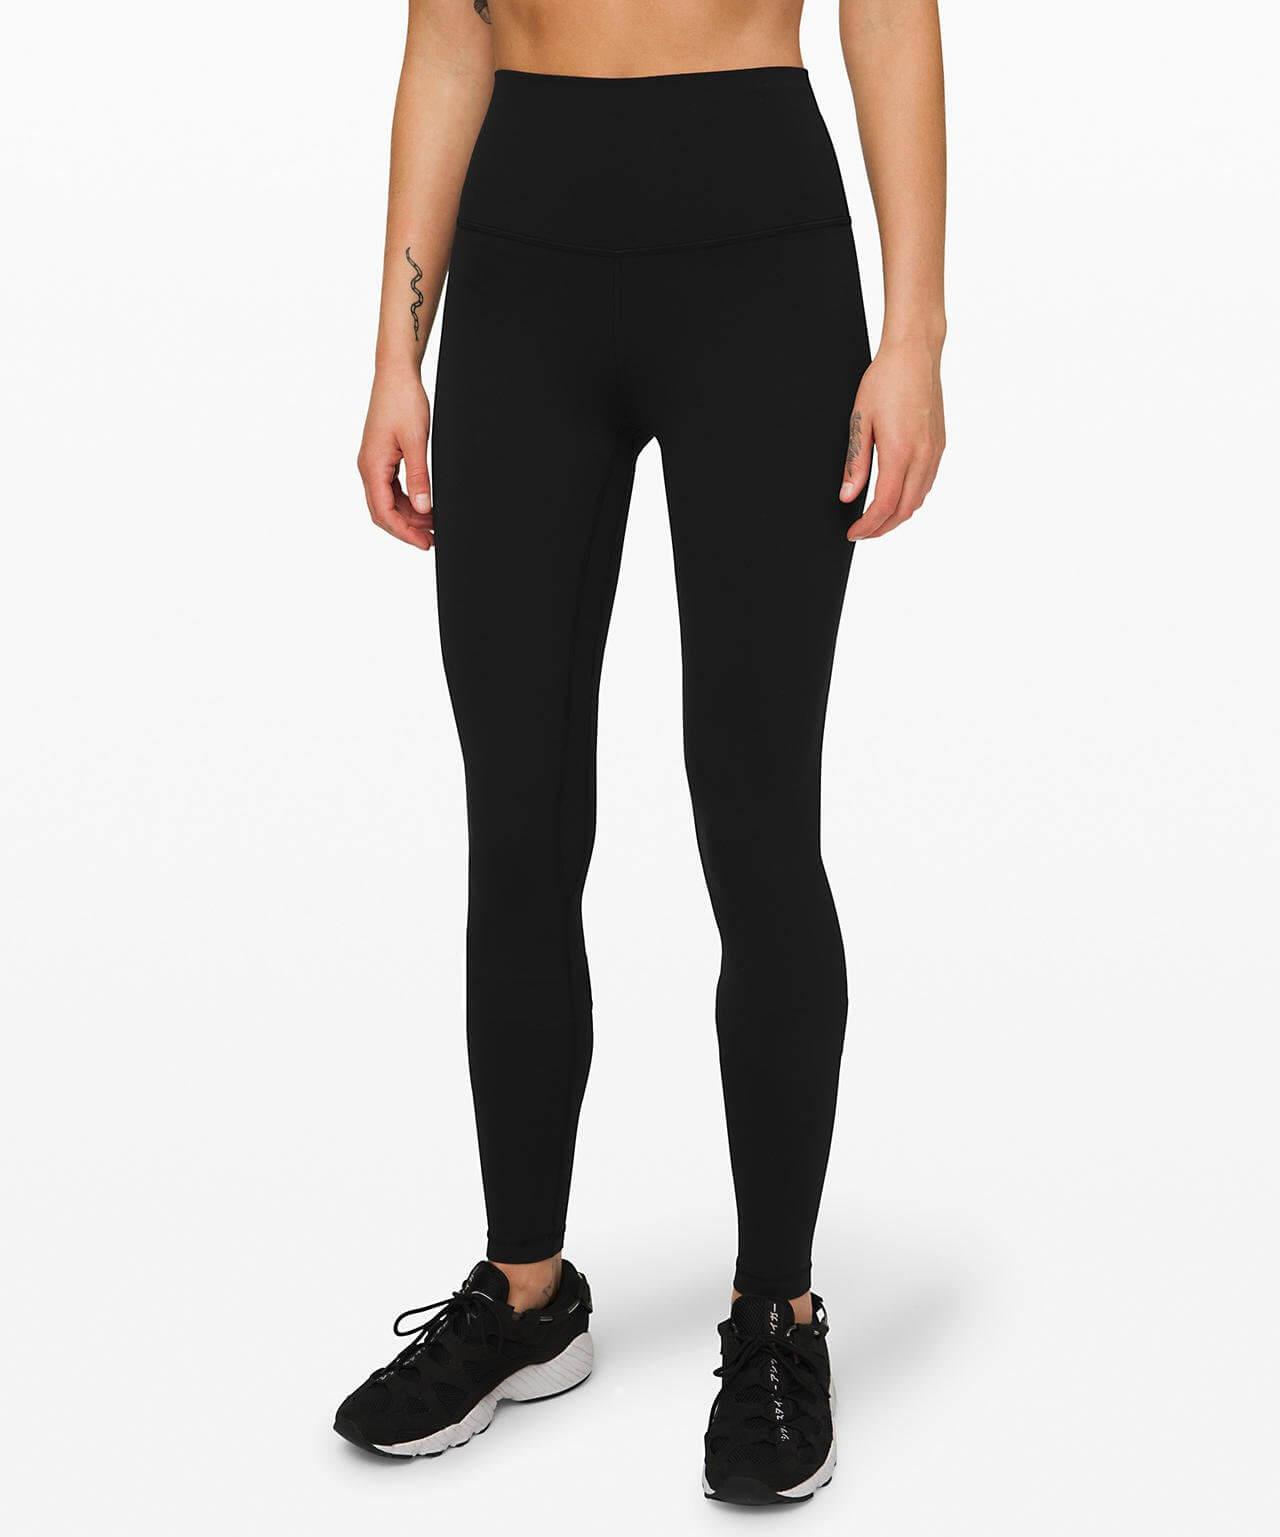 Align Pant Lululemon most comfortable travel pants